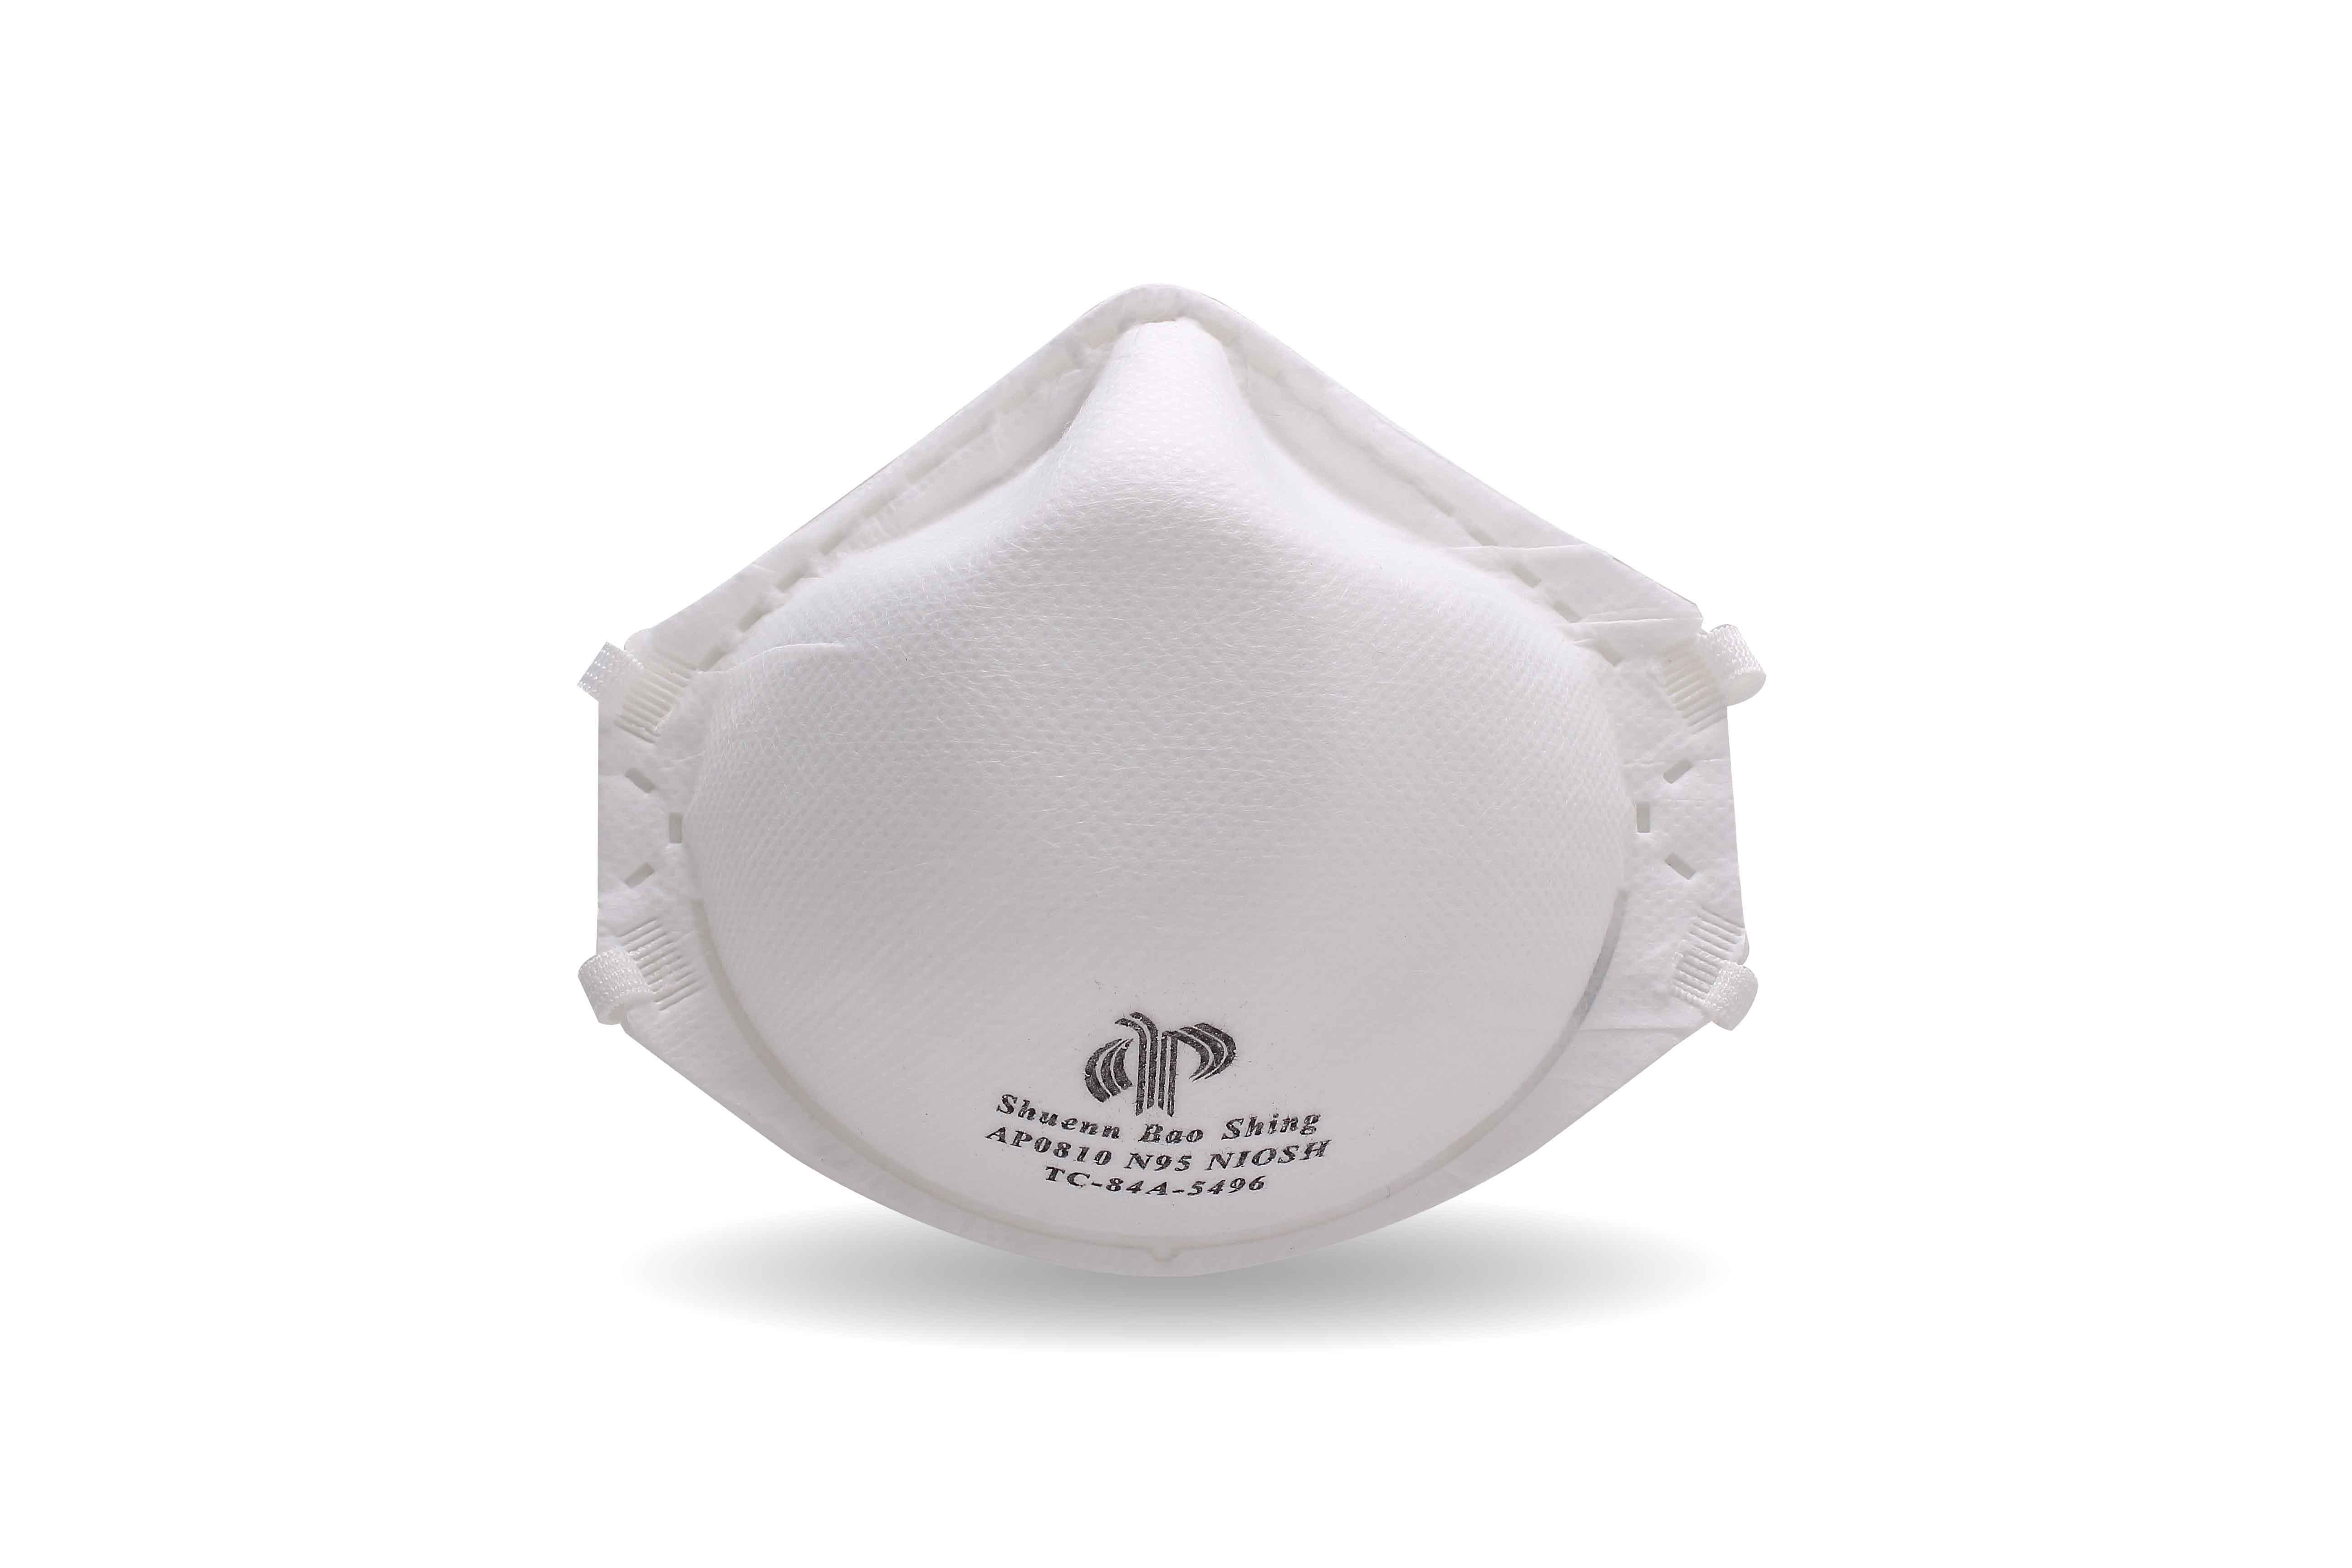 Pro Respirator Ltd N95 Ap0810 Co Niosh Particulate Aero